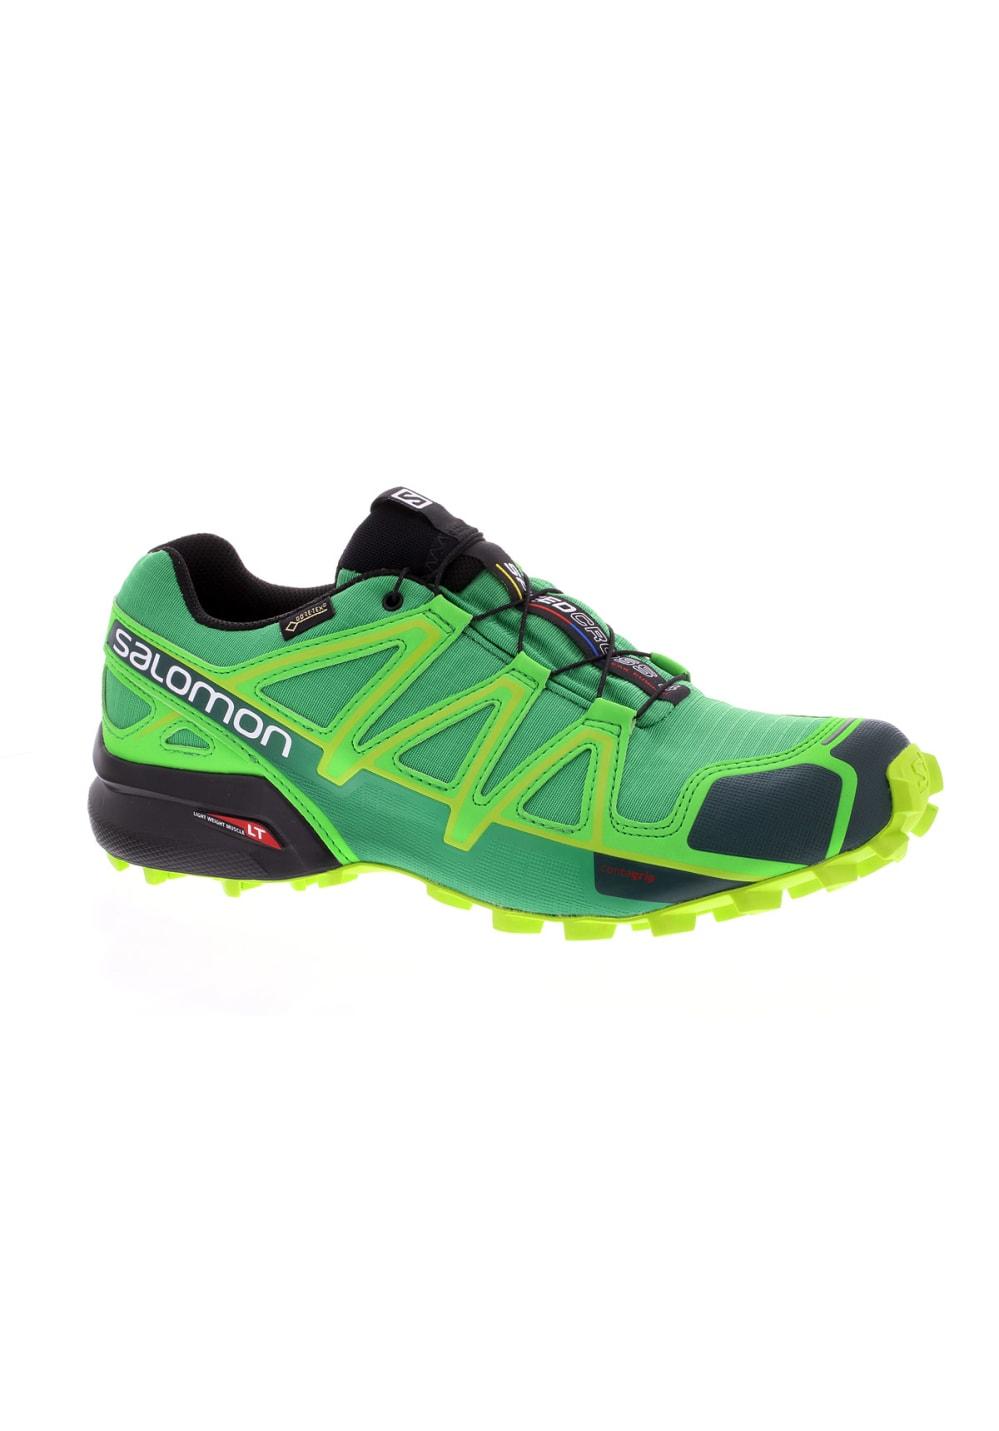 752e7fcd Salomon Speedcross 4 GTX - Running shoes for Men - Green | 21RUN